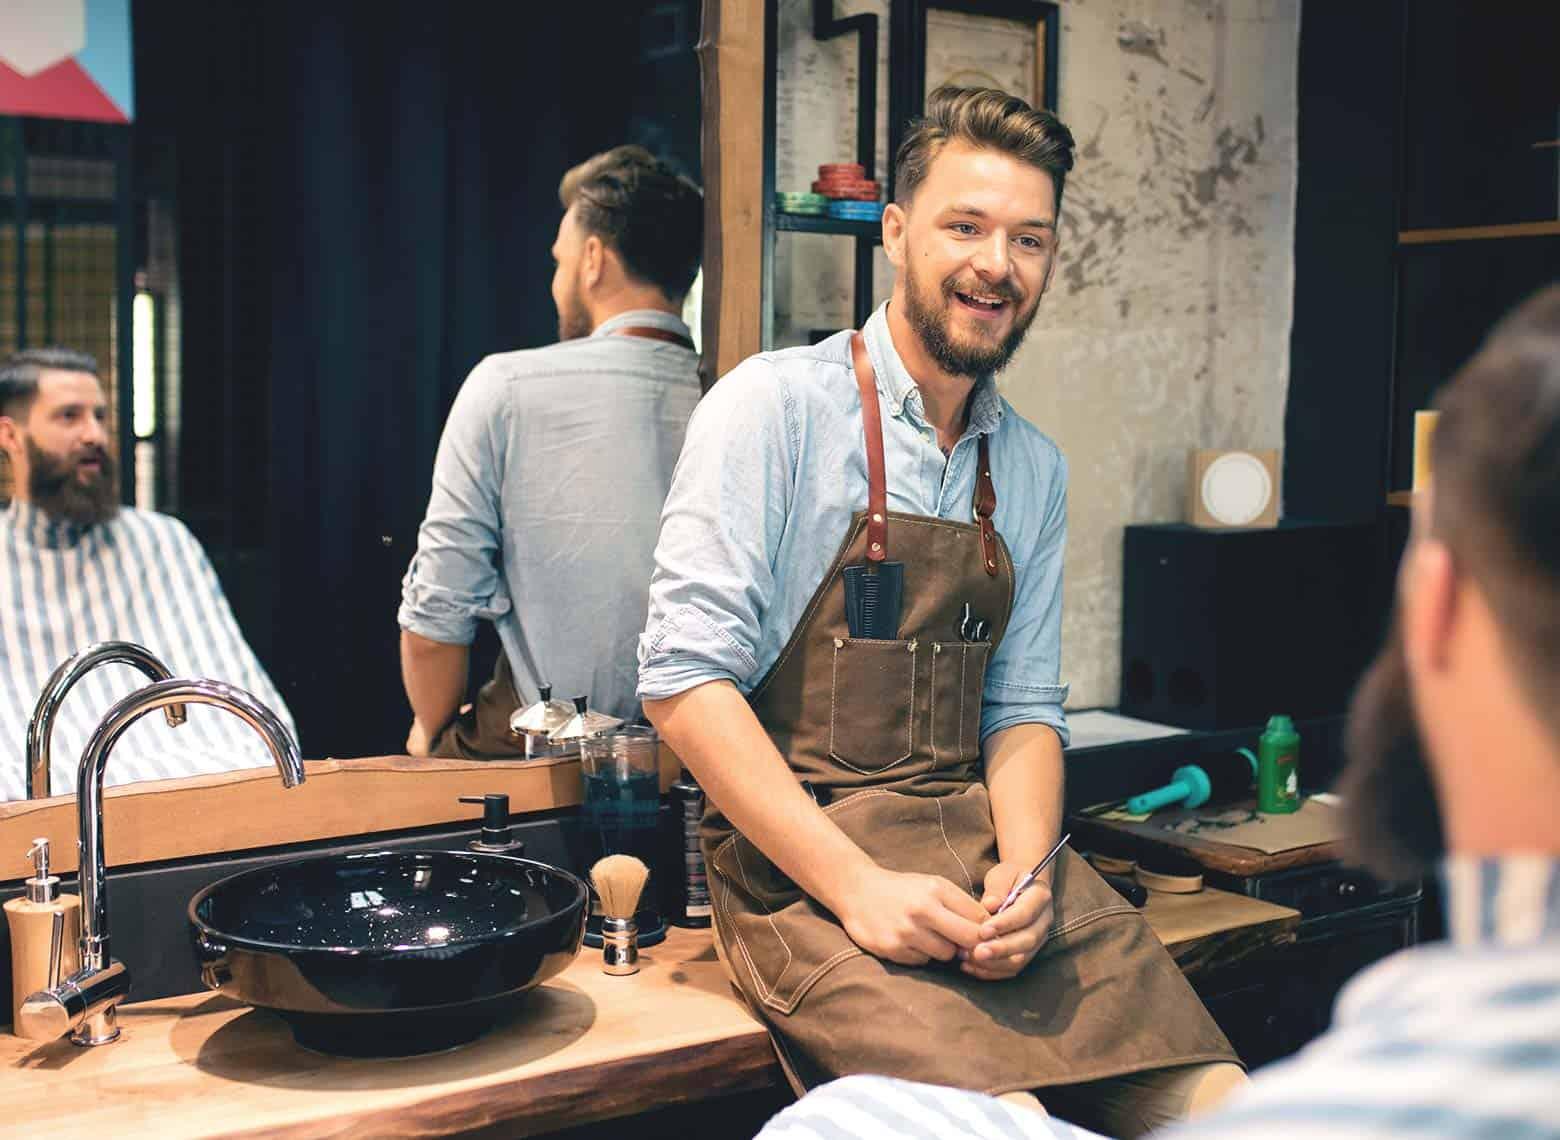 barber speaking to customer